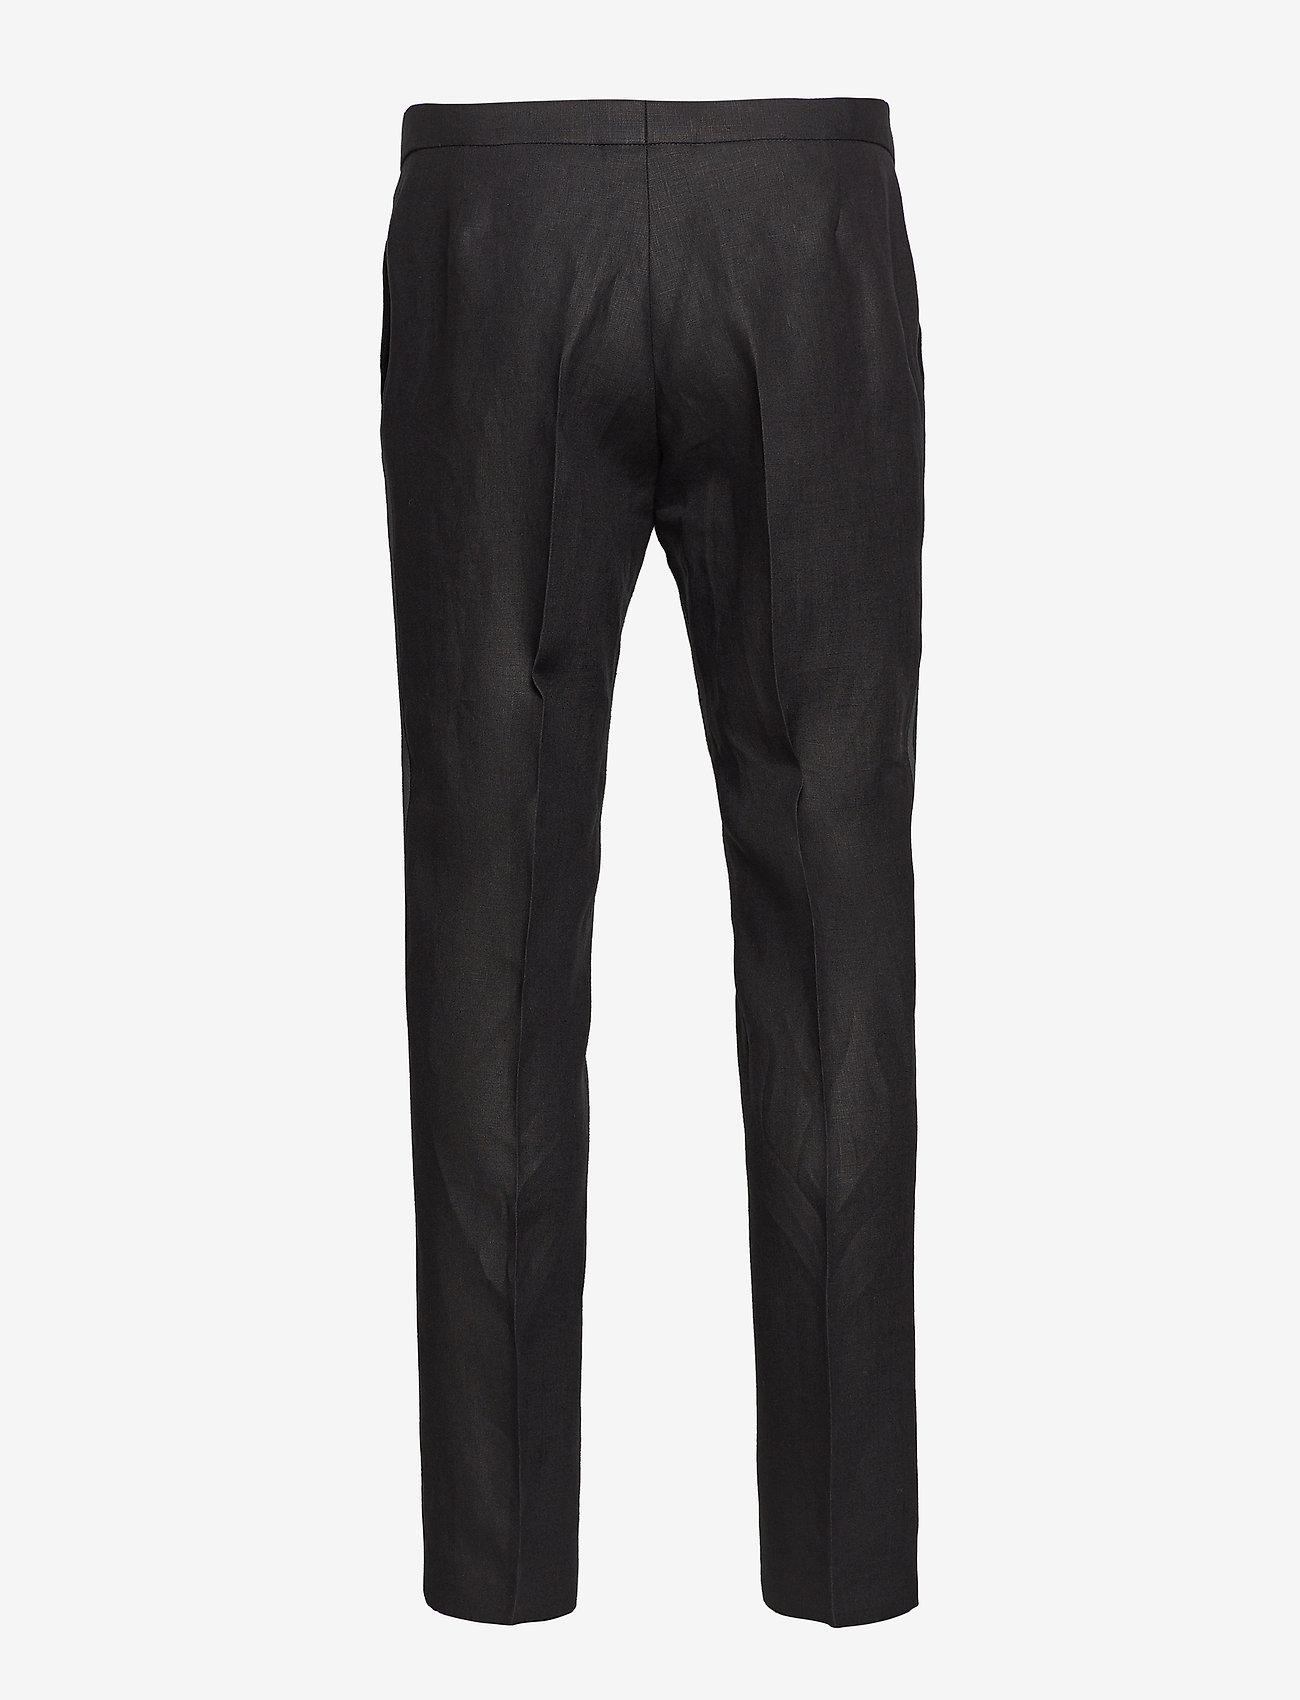 Devon Trousers (310 - Black) - Oscar Jacobson axhYk0